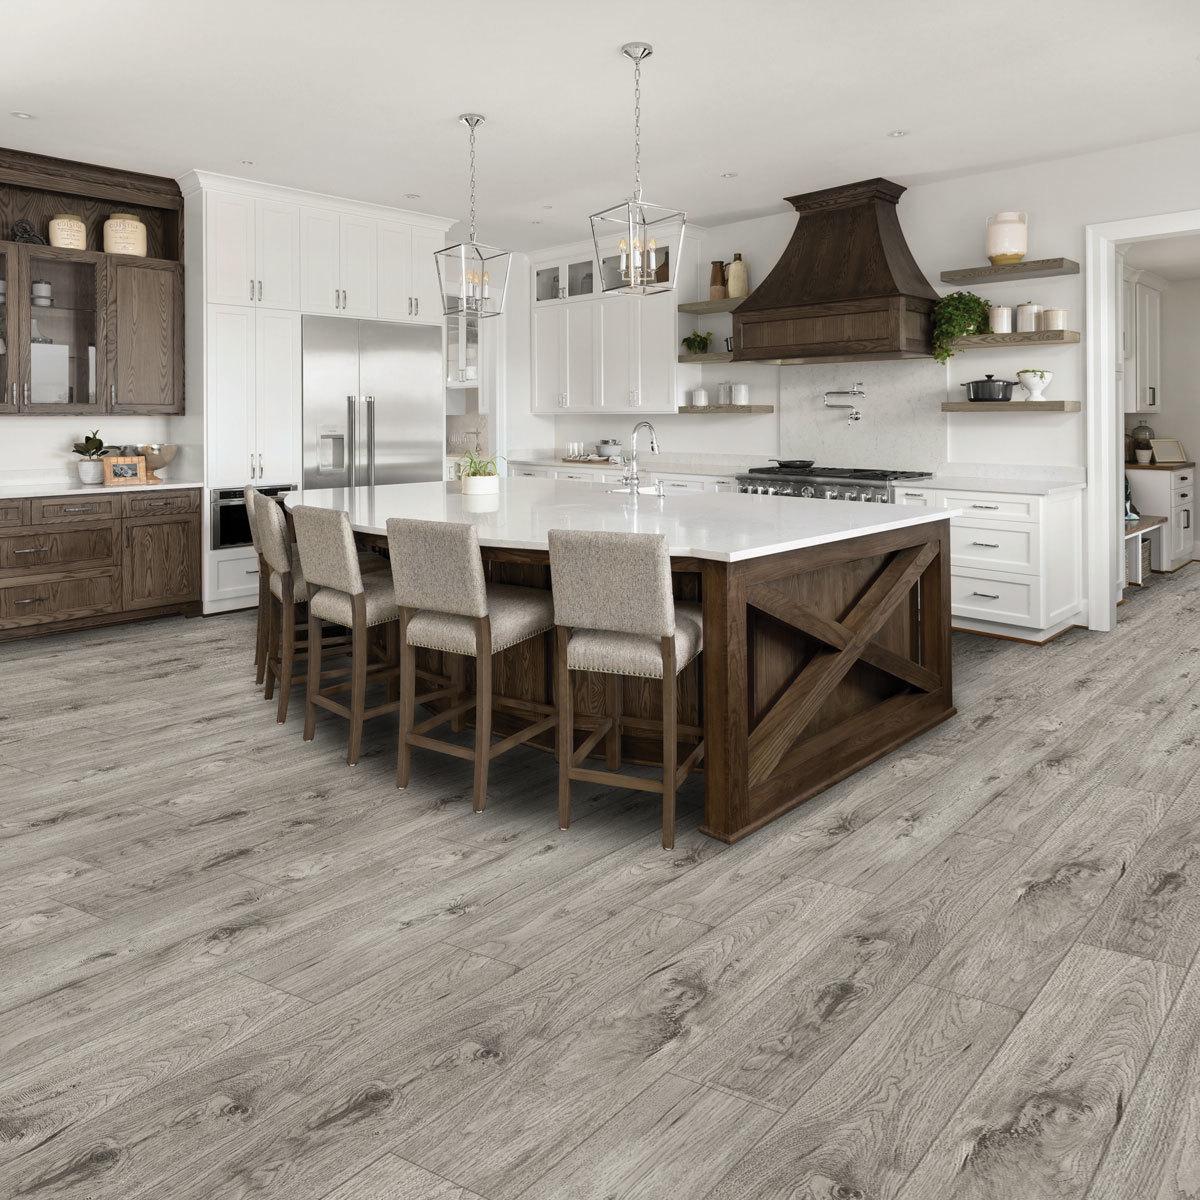 golden select modern grey rigid core spc luxury vinyl flooring planks with foam underlay 1 33 m per pack costco uk